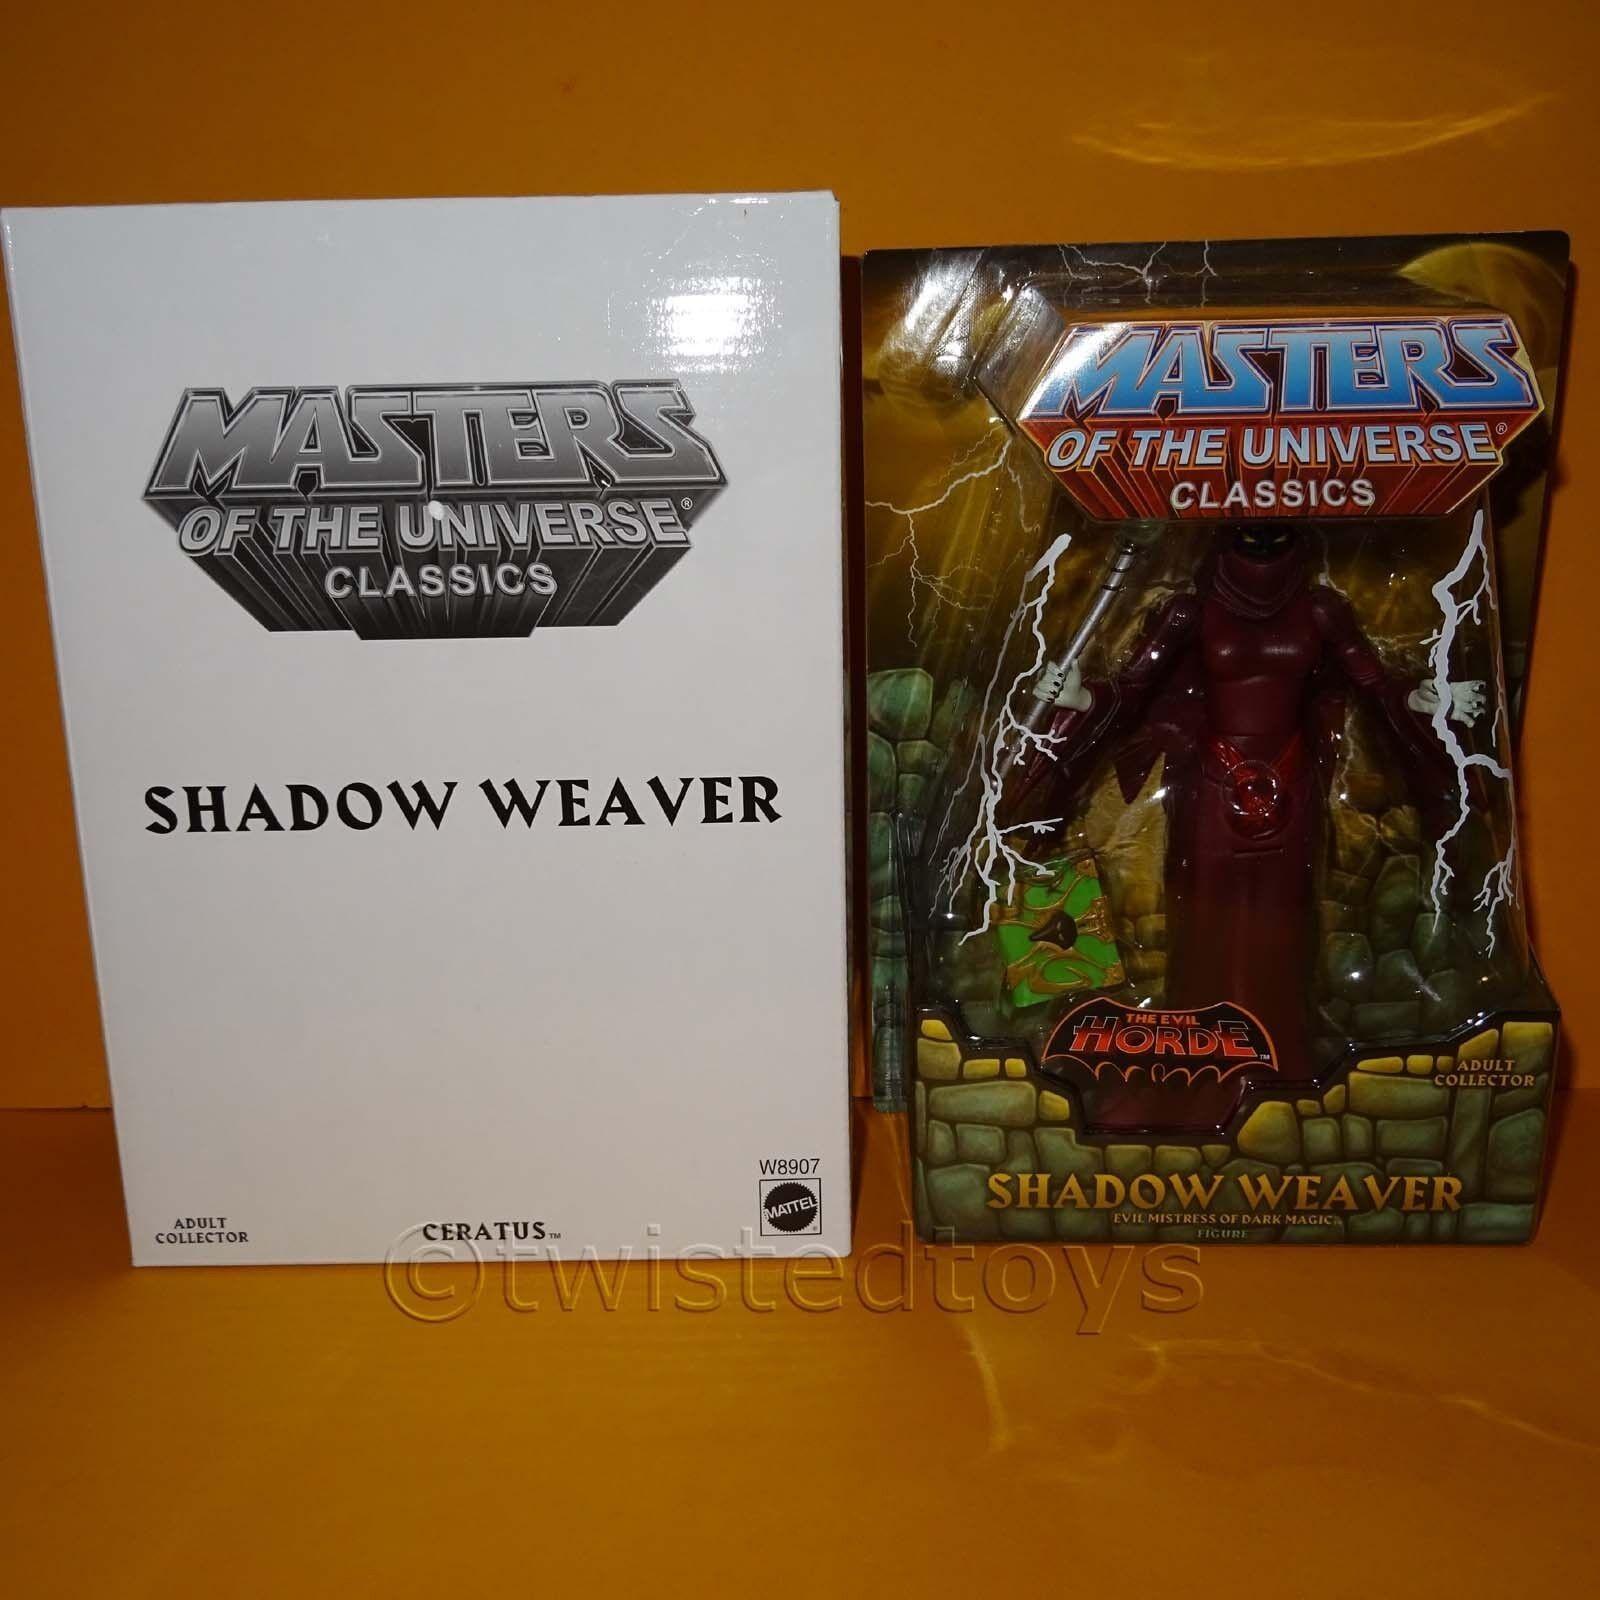 2011 MATTEL MOTU HE-uomo Masters Of the Universe  classeeics ombra WEAVER MOC autoD  liquidazione